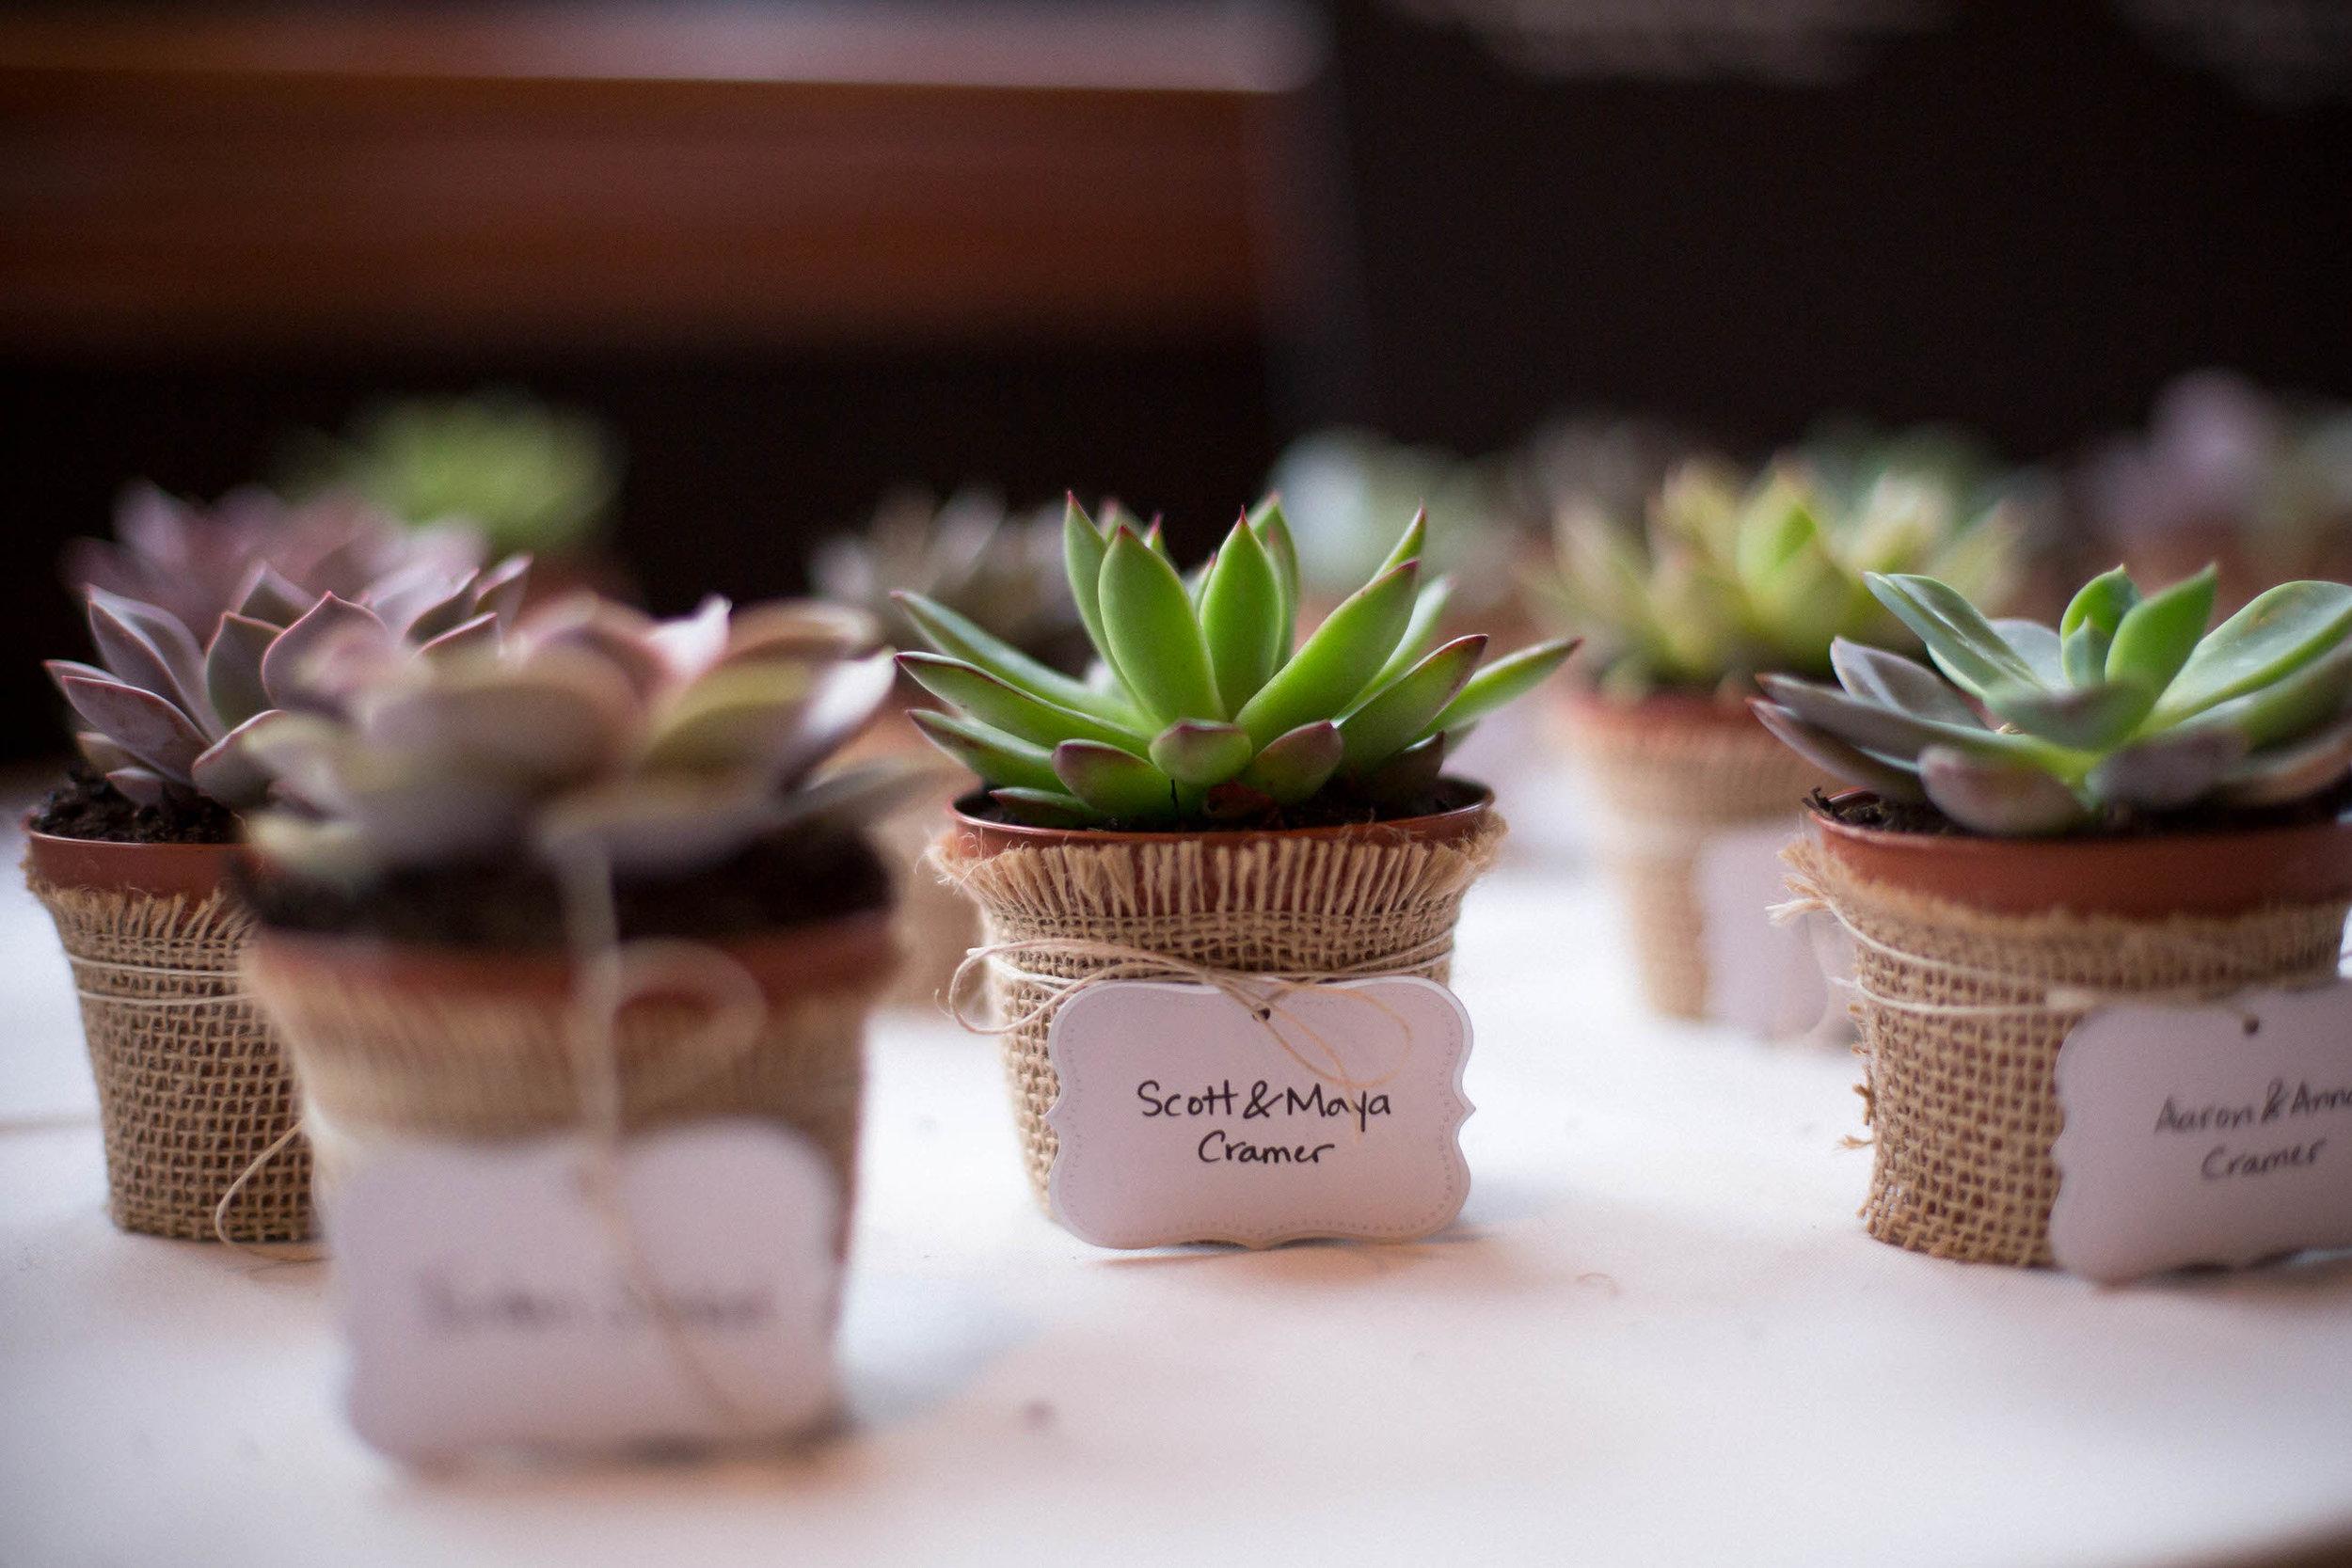 cactus-gifts-wedding-ideas-tiny-house-photo.jpg